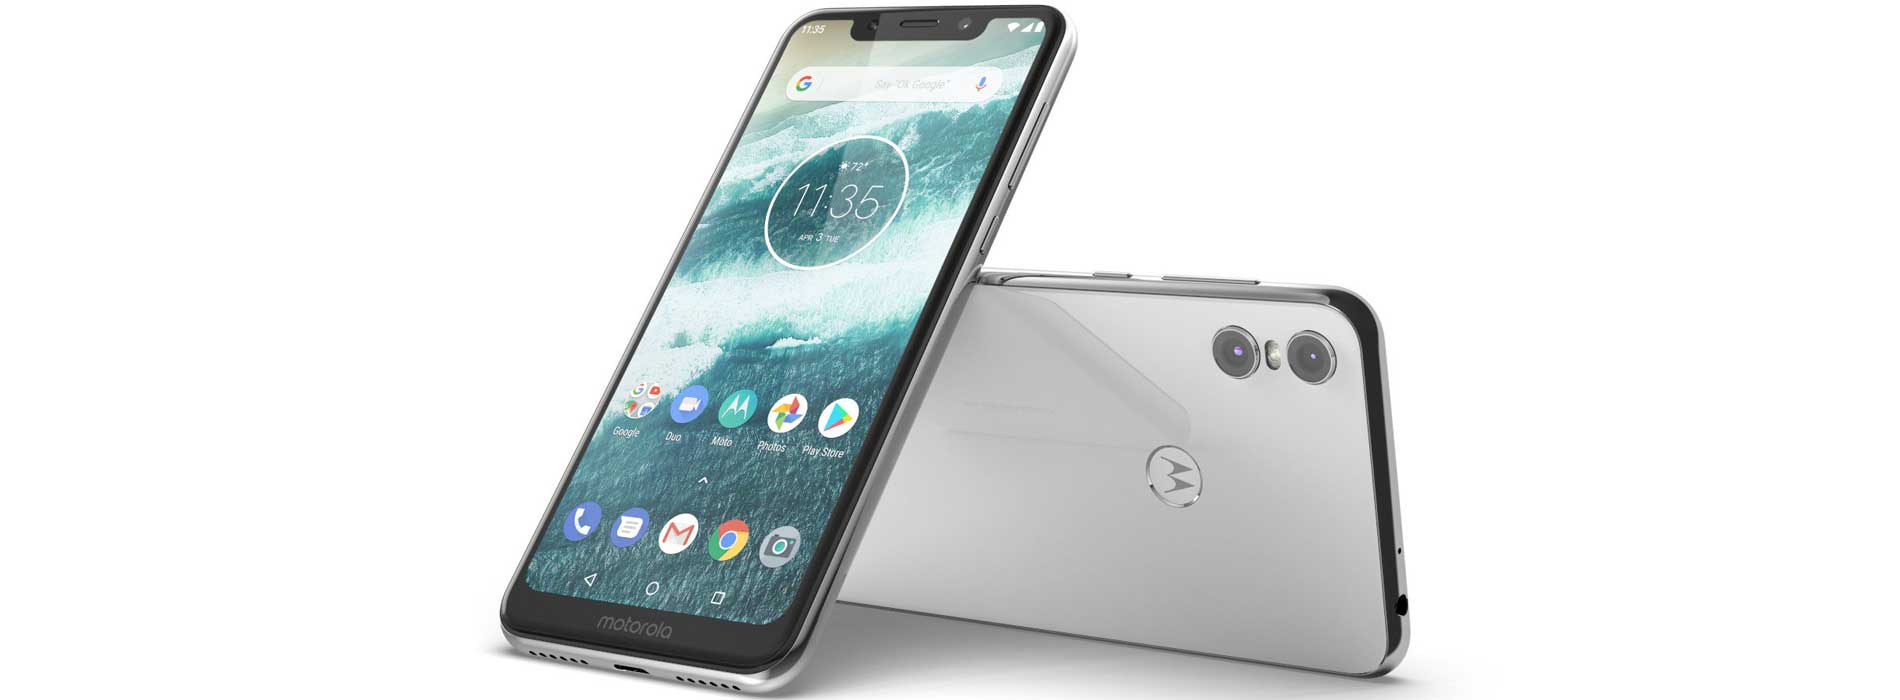 Análise: Motorola One - Vale a pena o smartphone com Android One?